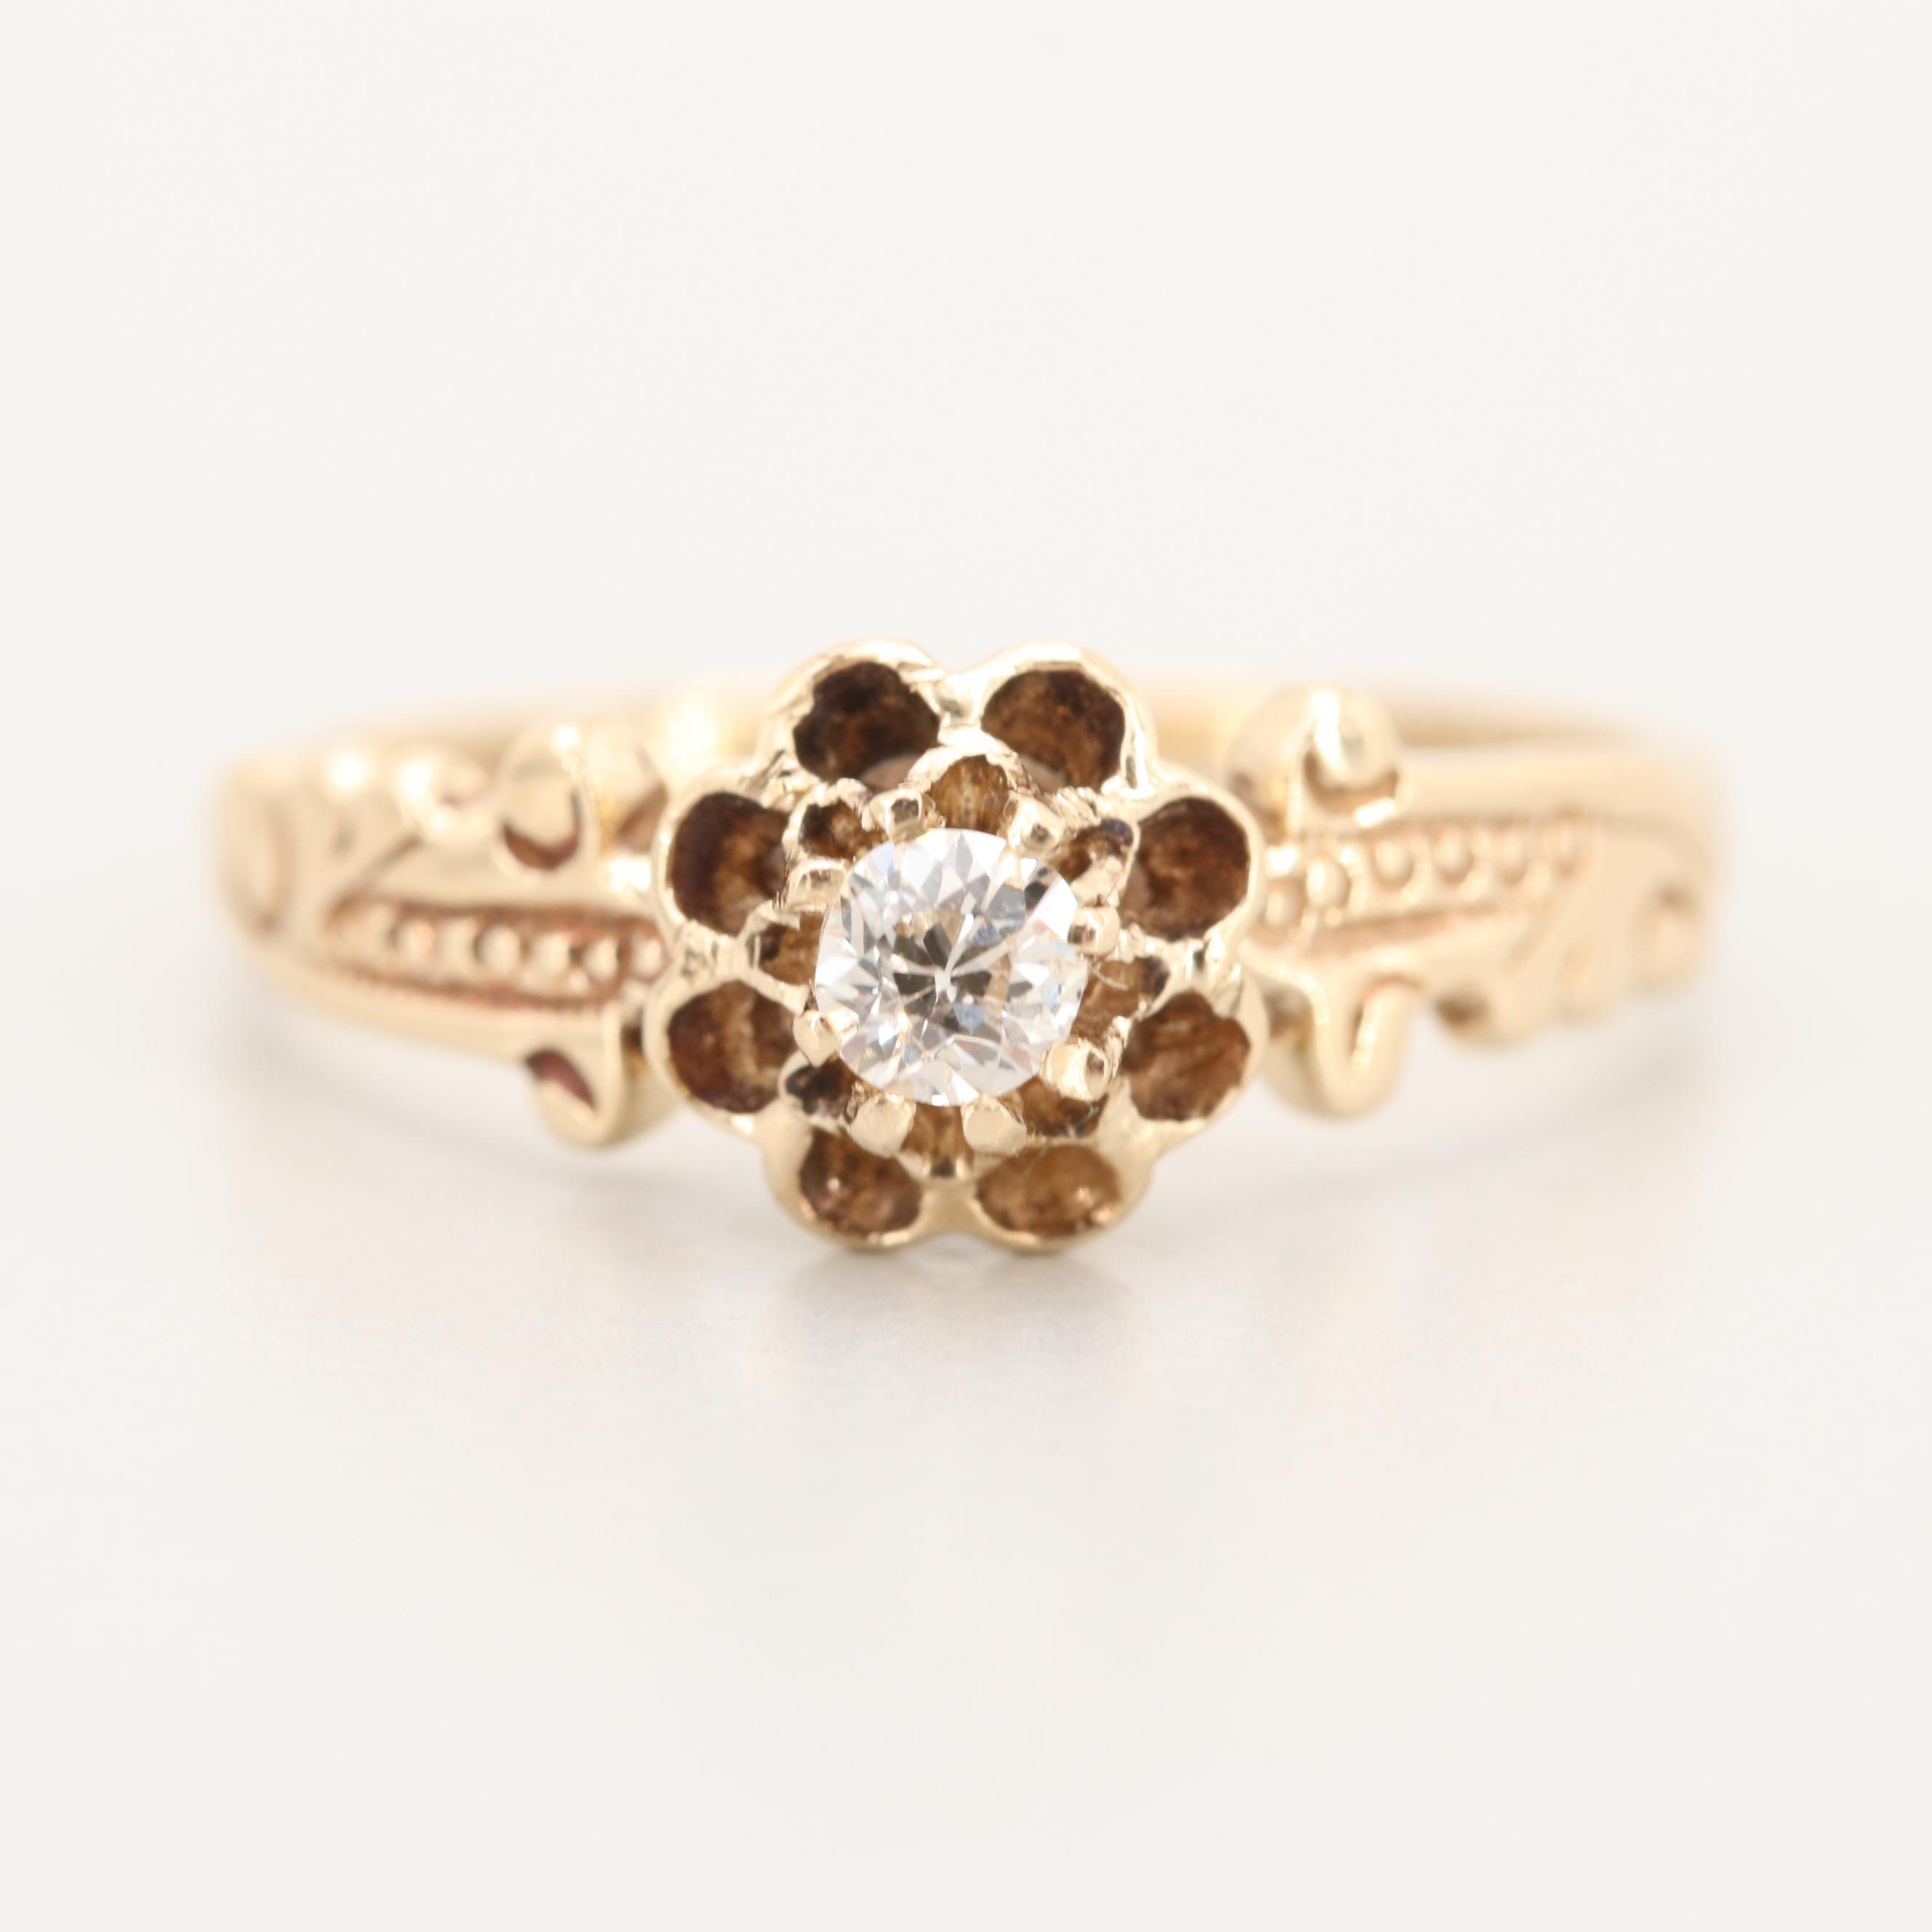 Antique 10K Yellow Gold Diamond Ring